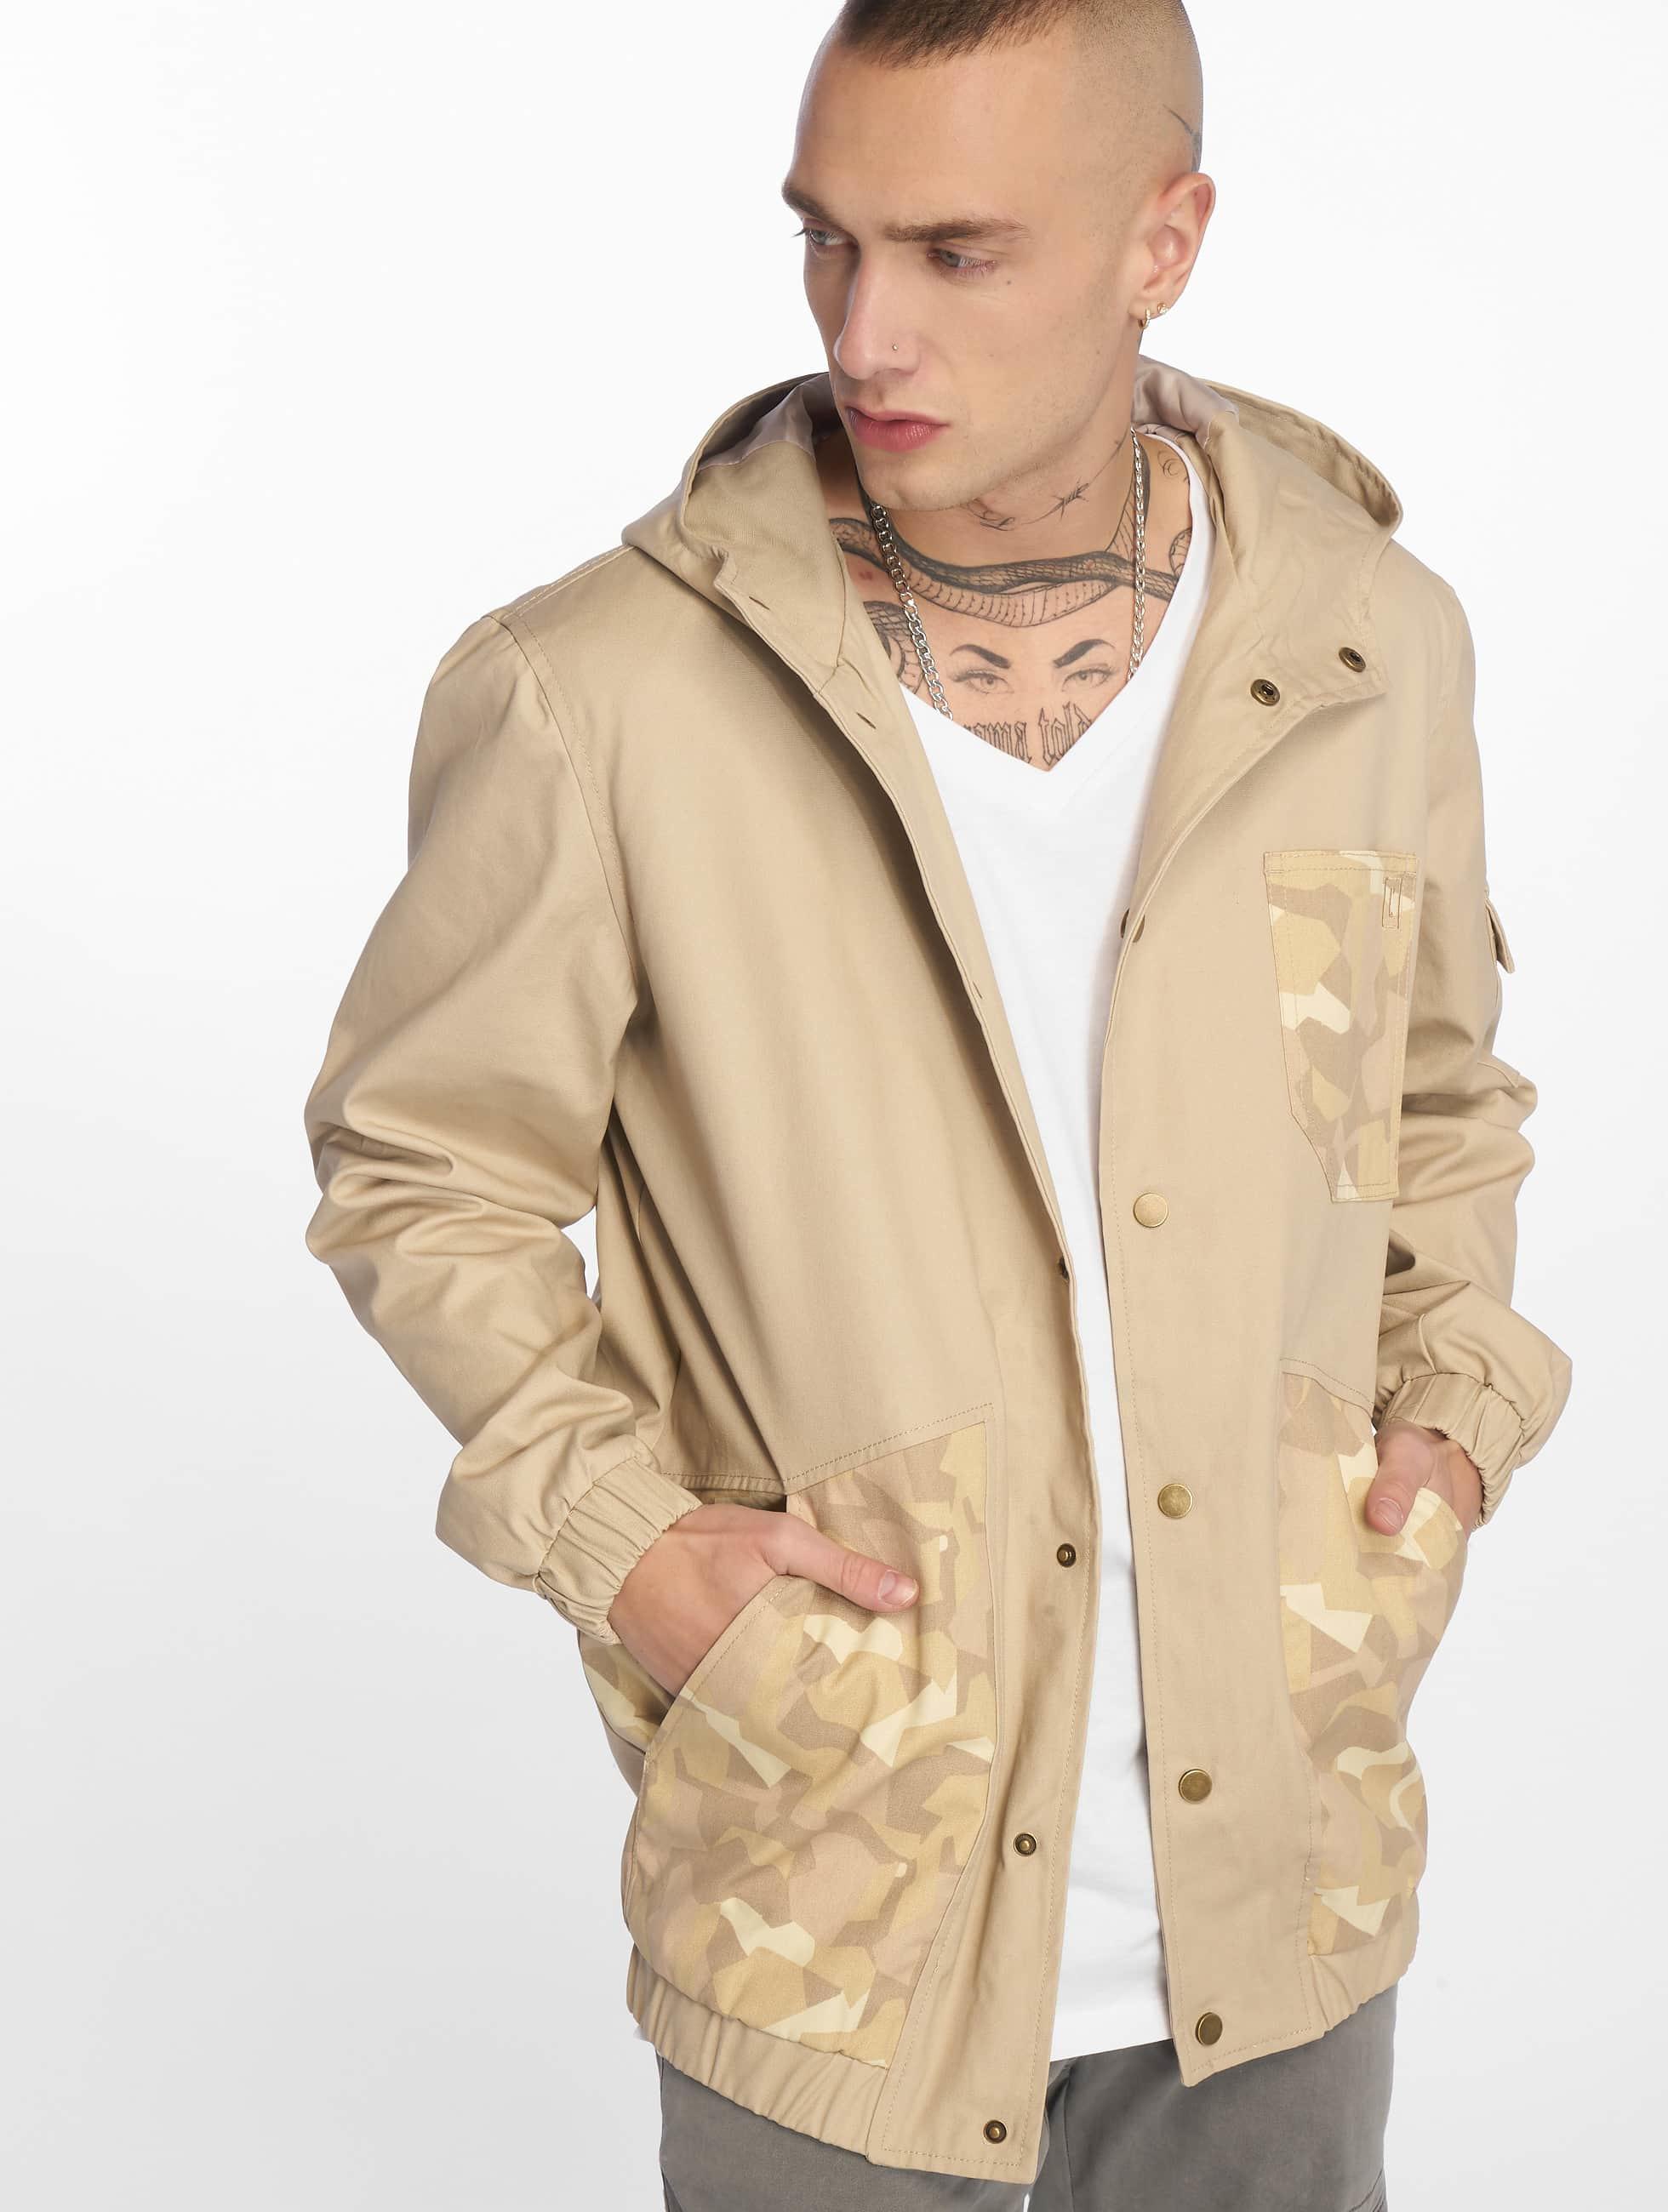 Cyprime / Lightweight Jacket Moonstone in beige XL